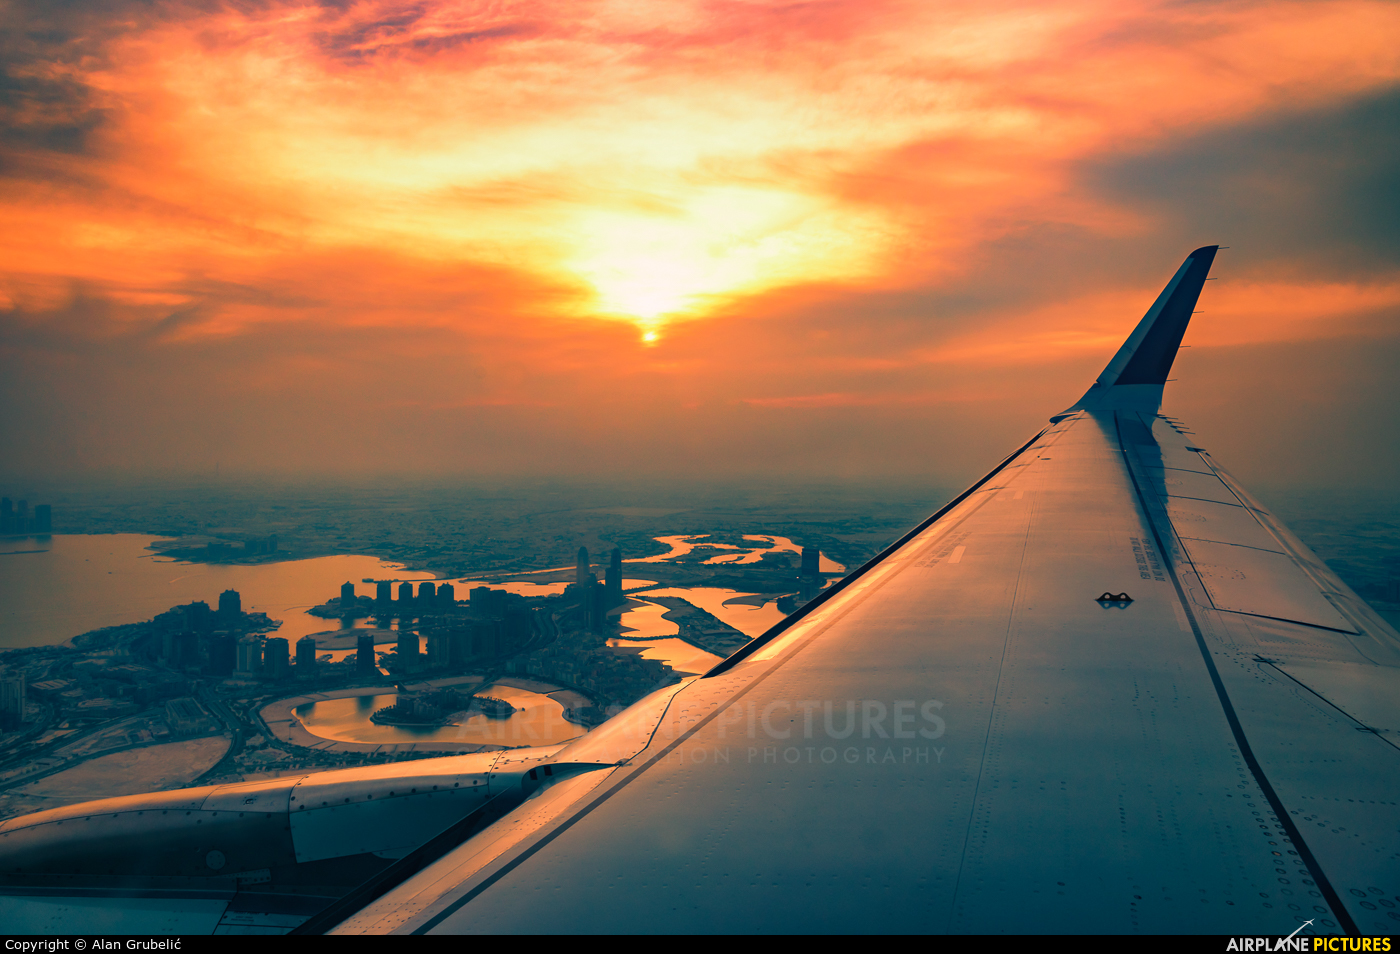 Qatar Airways A7-AHT aircraft at Doha/In Flight